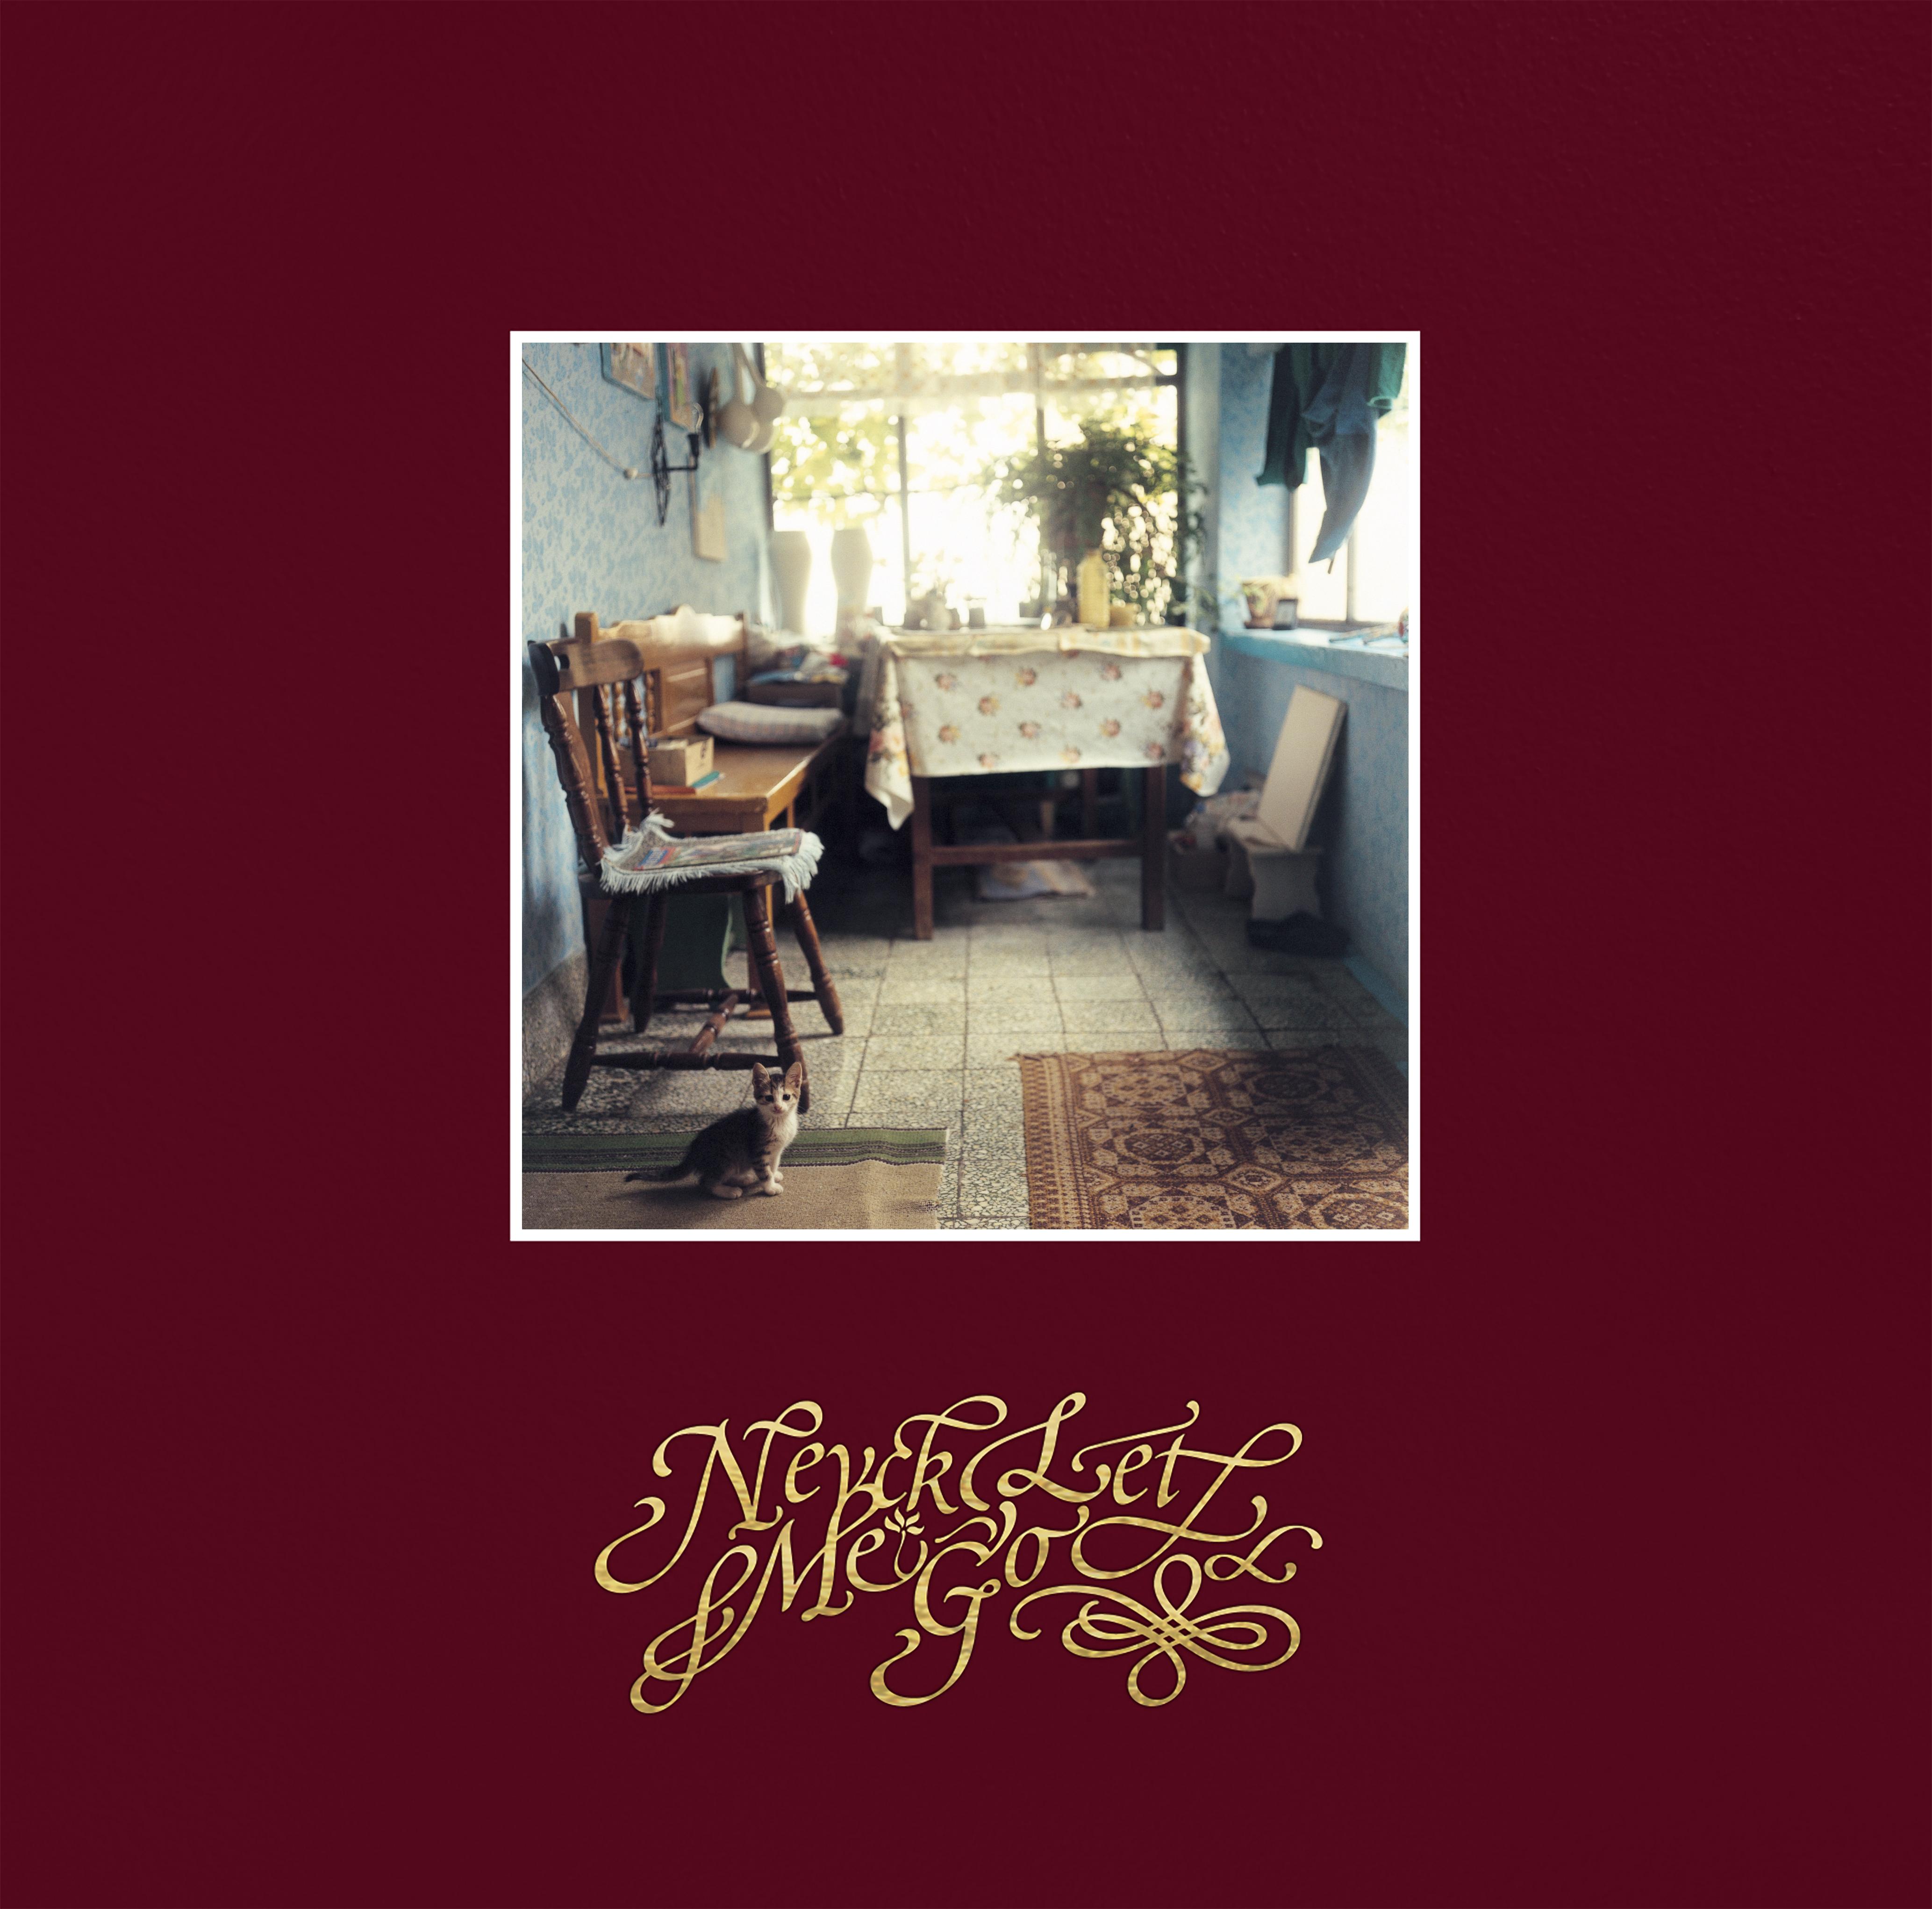 「Never Let Me Go」北園みなみ(UVCA-3033)2015/12/2